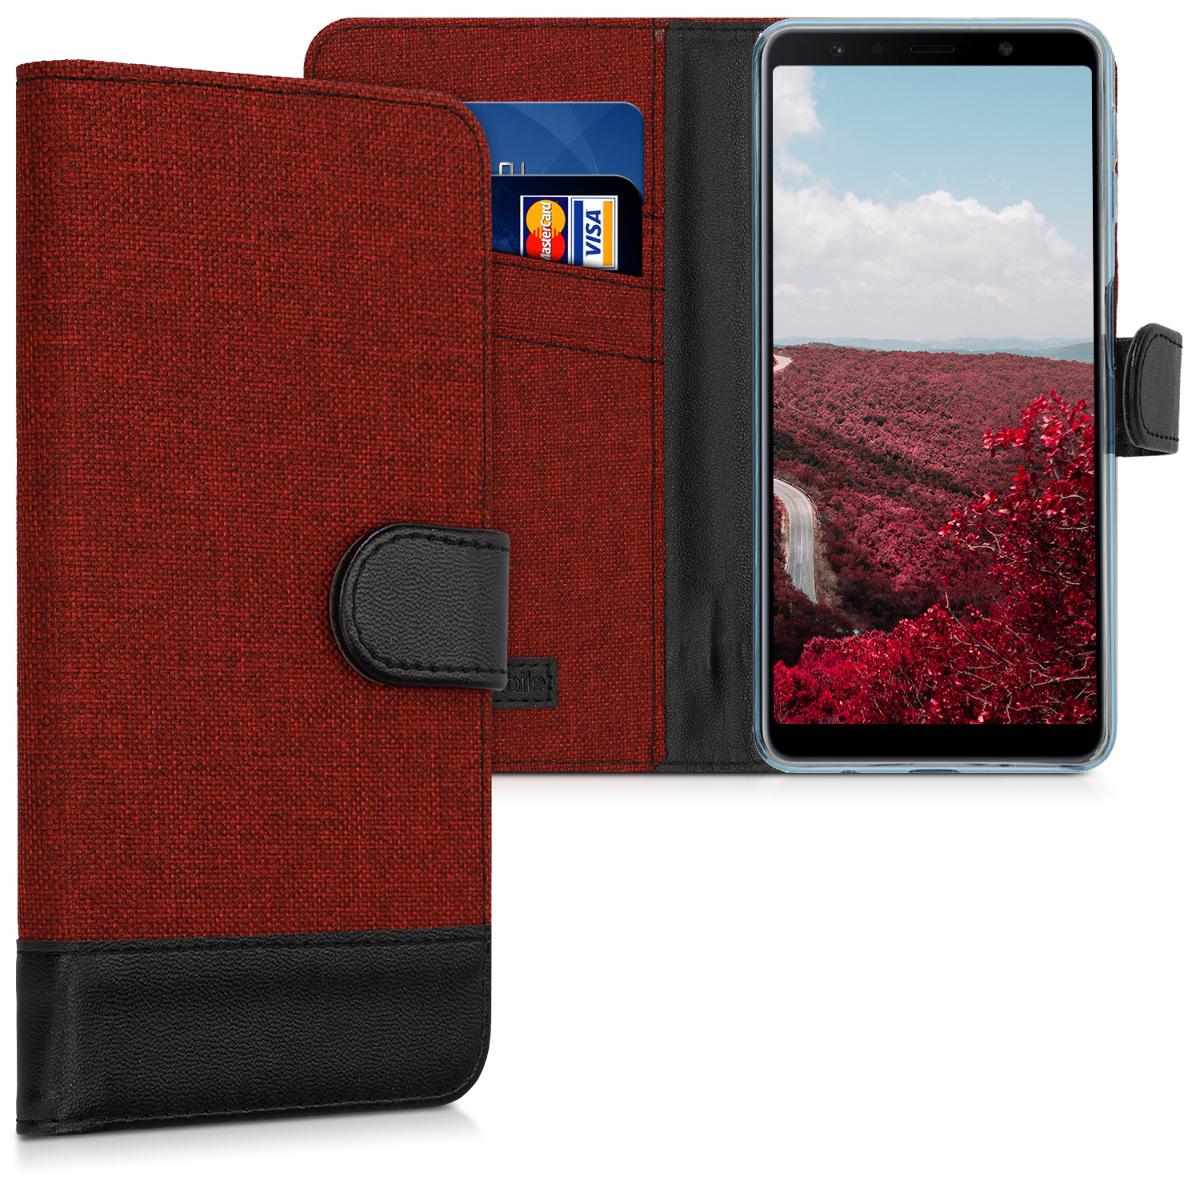 Fabricpouzdro pro Samsung A7 (2018) - tmavě červené / černé